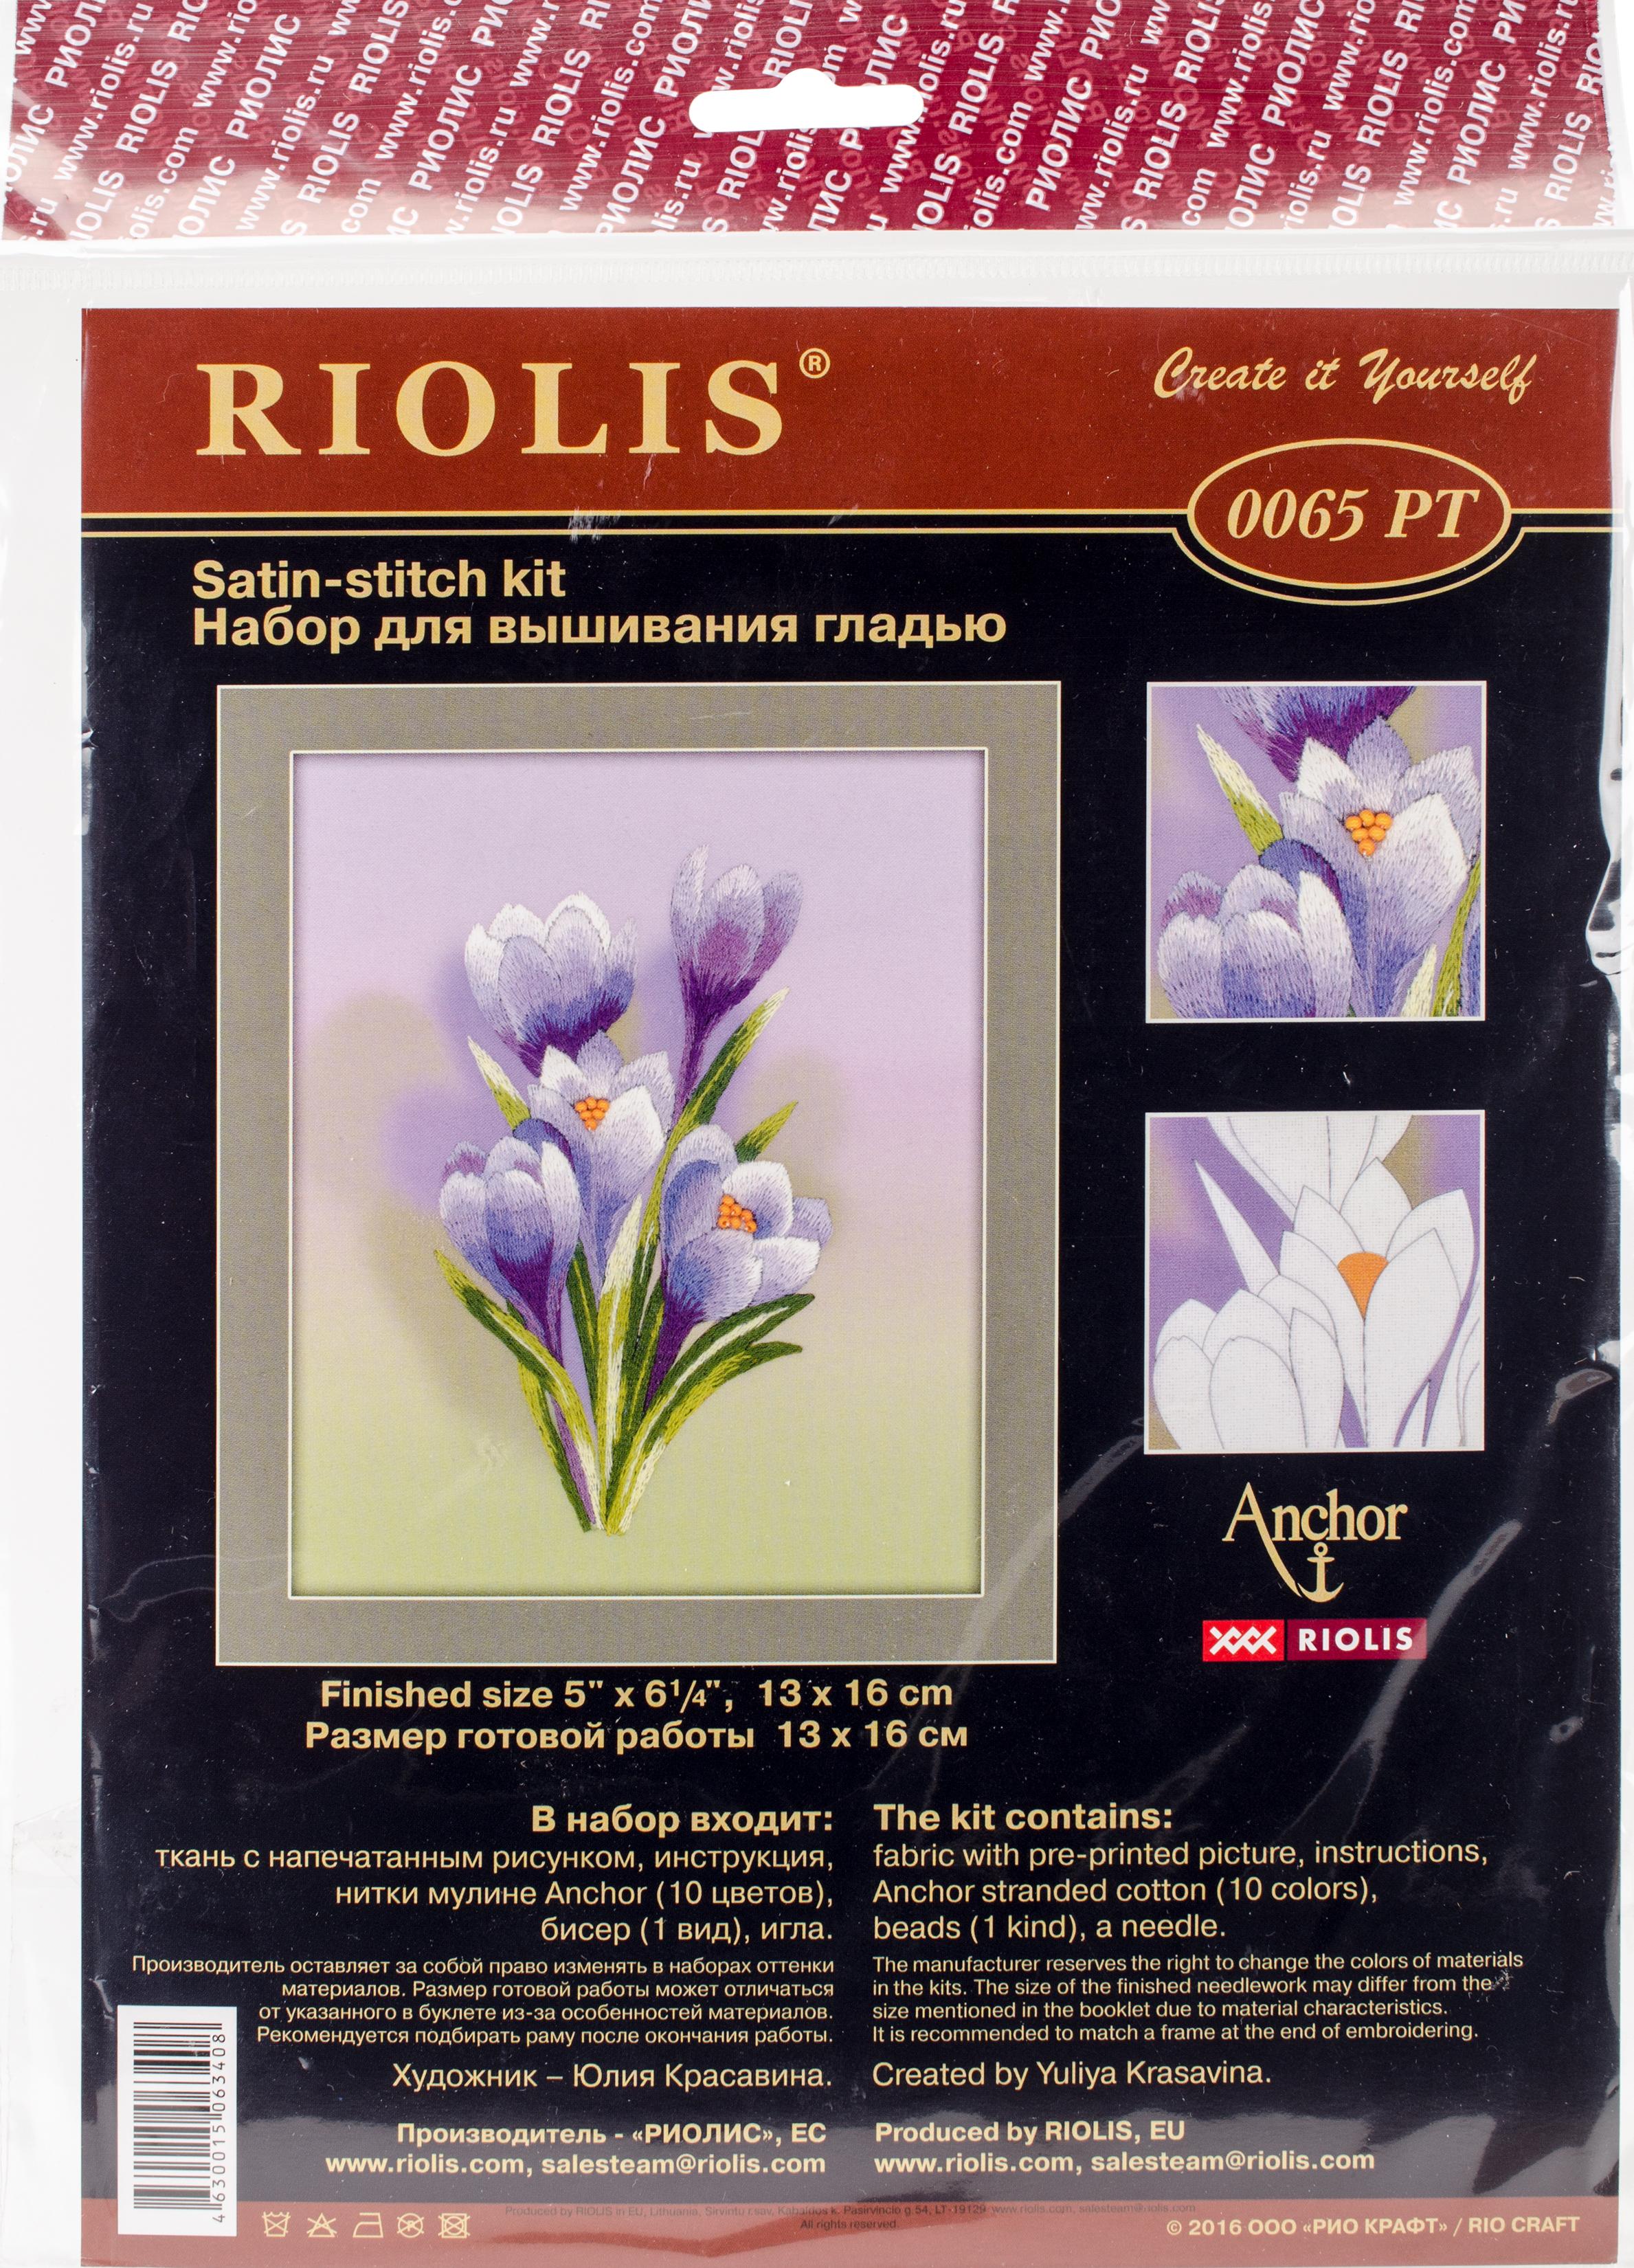 Crocuses Stamped Cross Stitch Kit -  RIOLIS, R0065PT